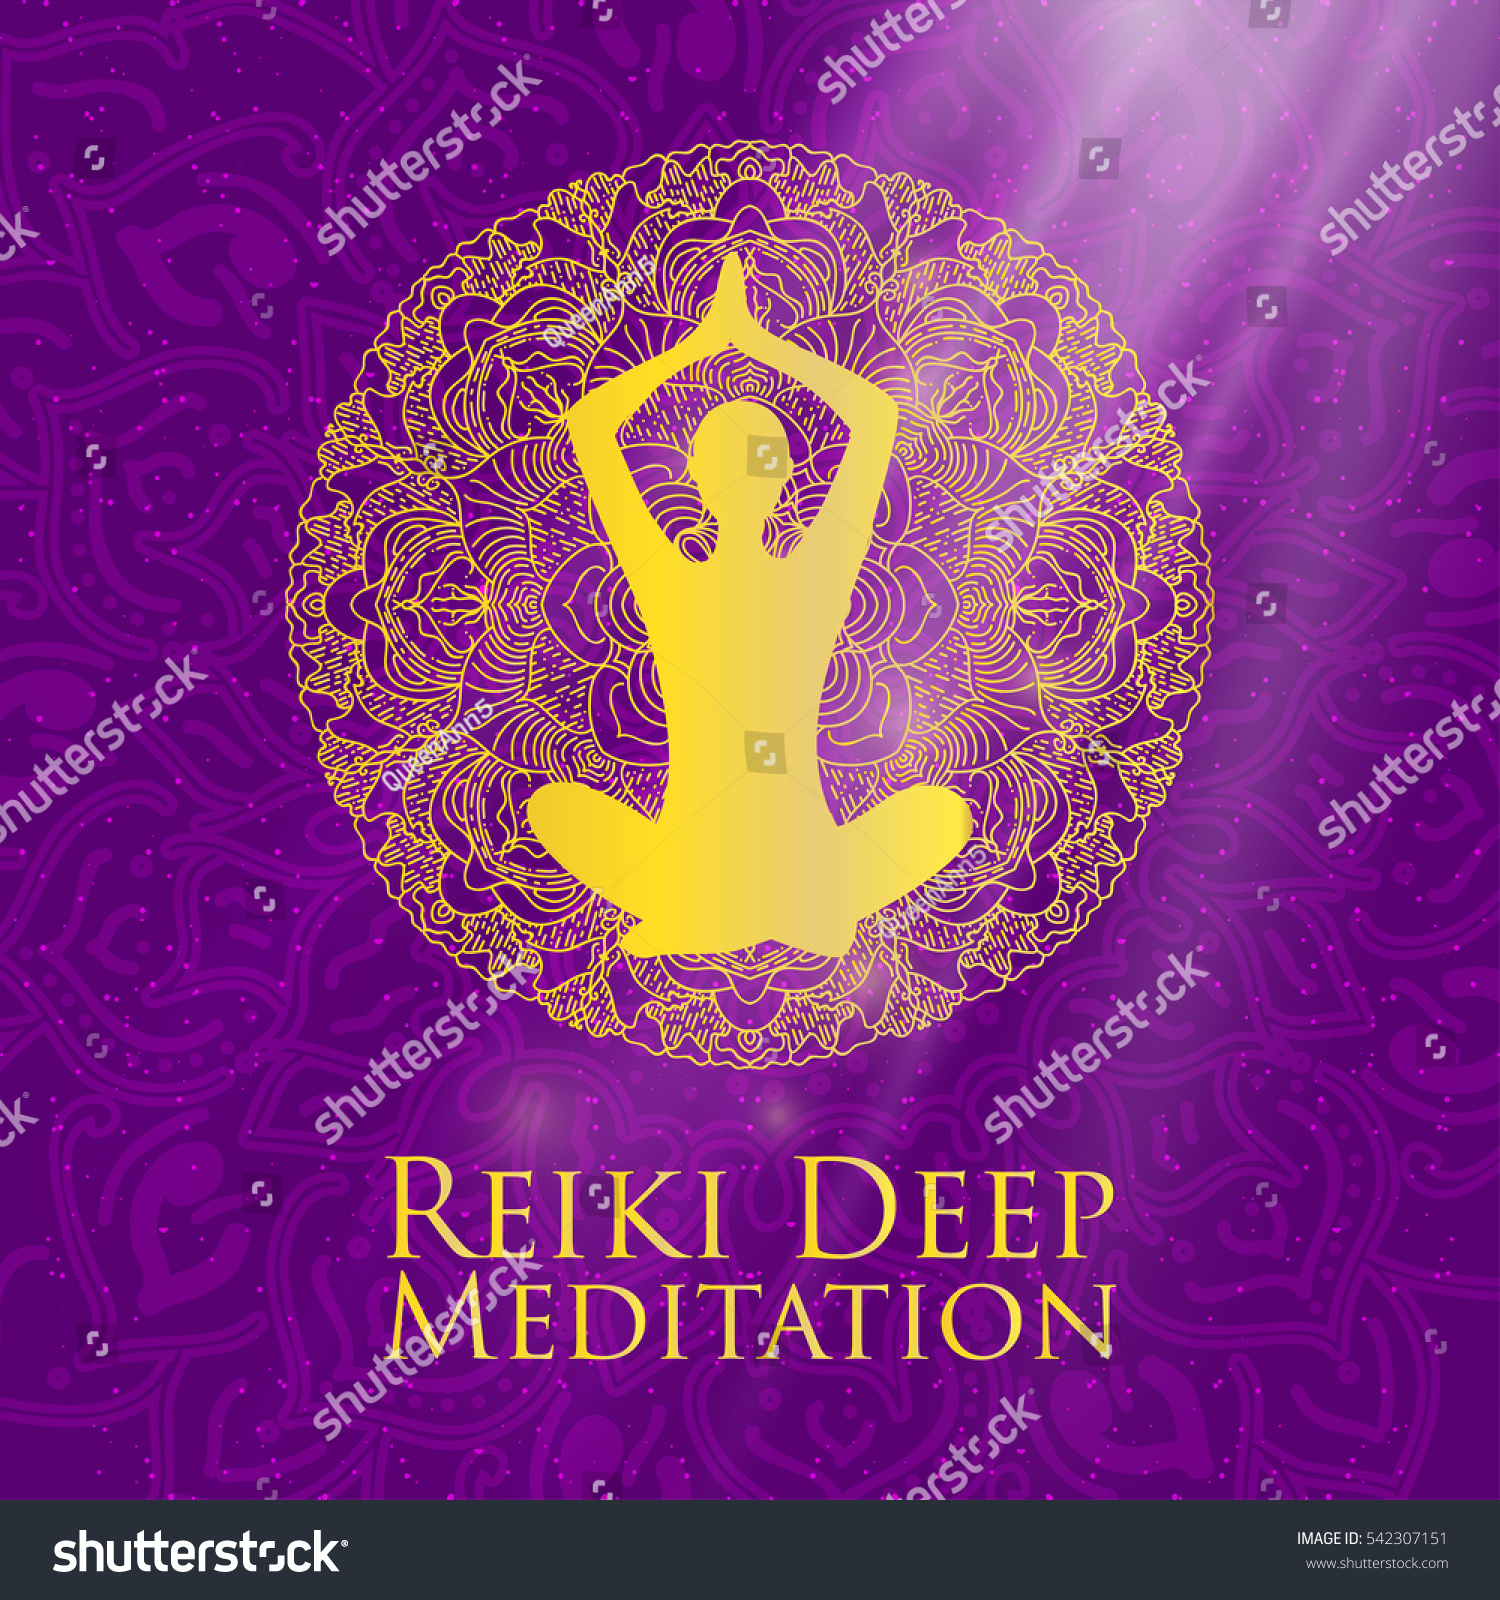 Sacred geometry reiki symbol word reiki stock vector 542307151 sacred geometry reiki symbol the word reiki is made up of two japanese words biocorpaavc